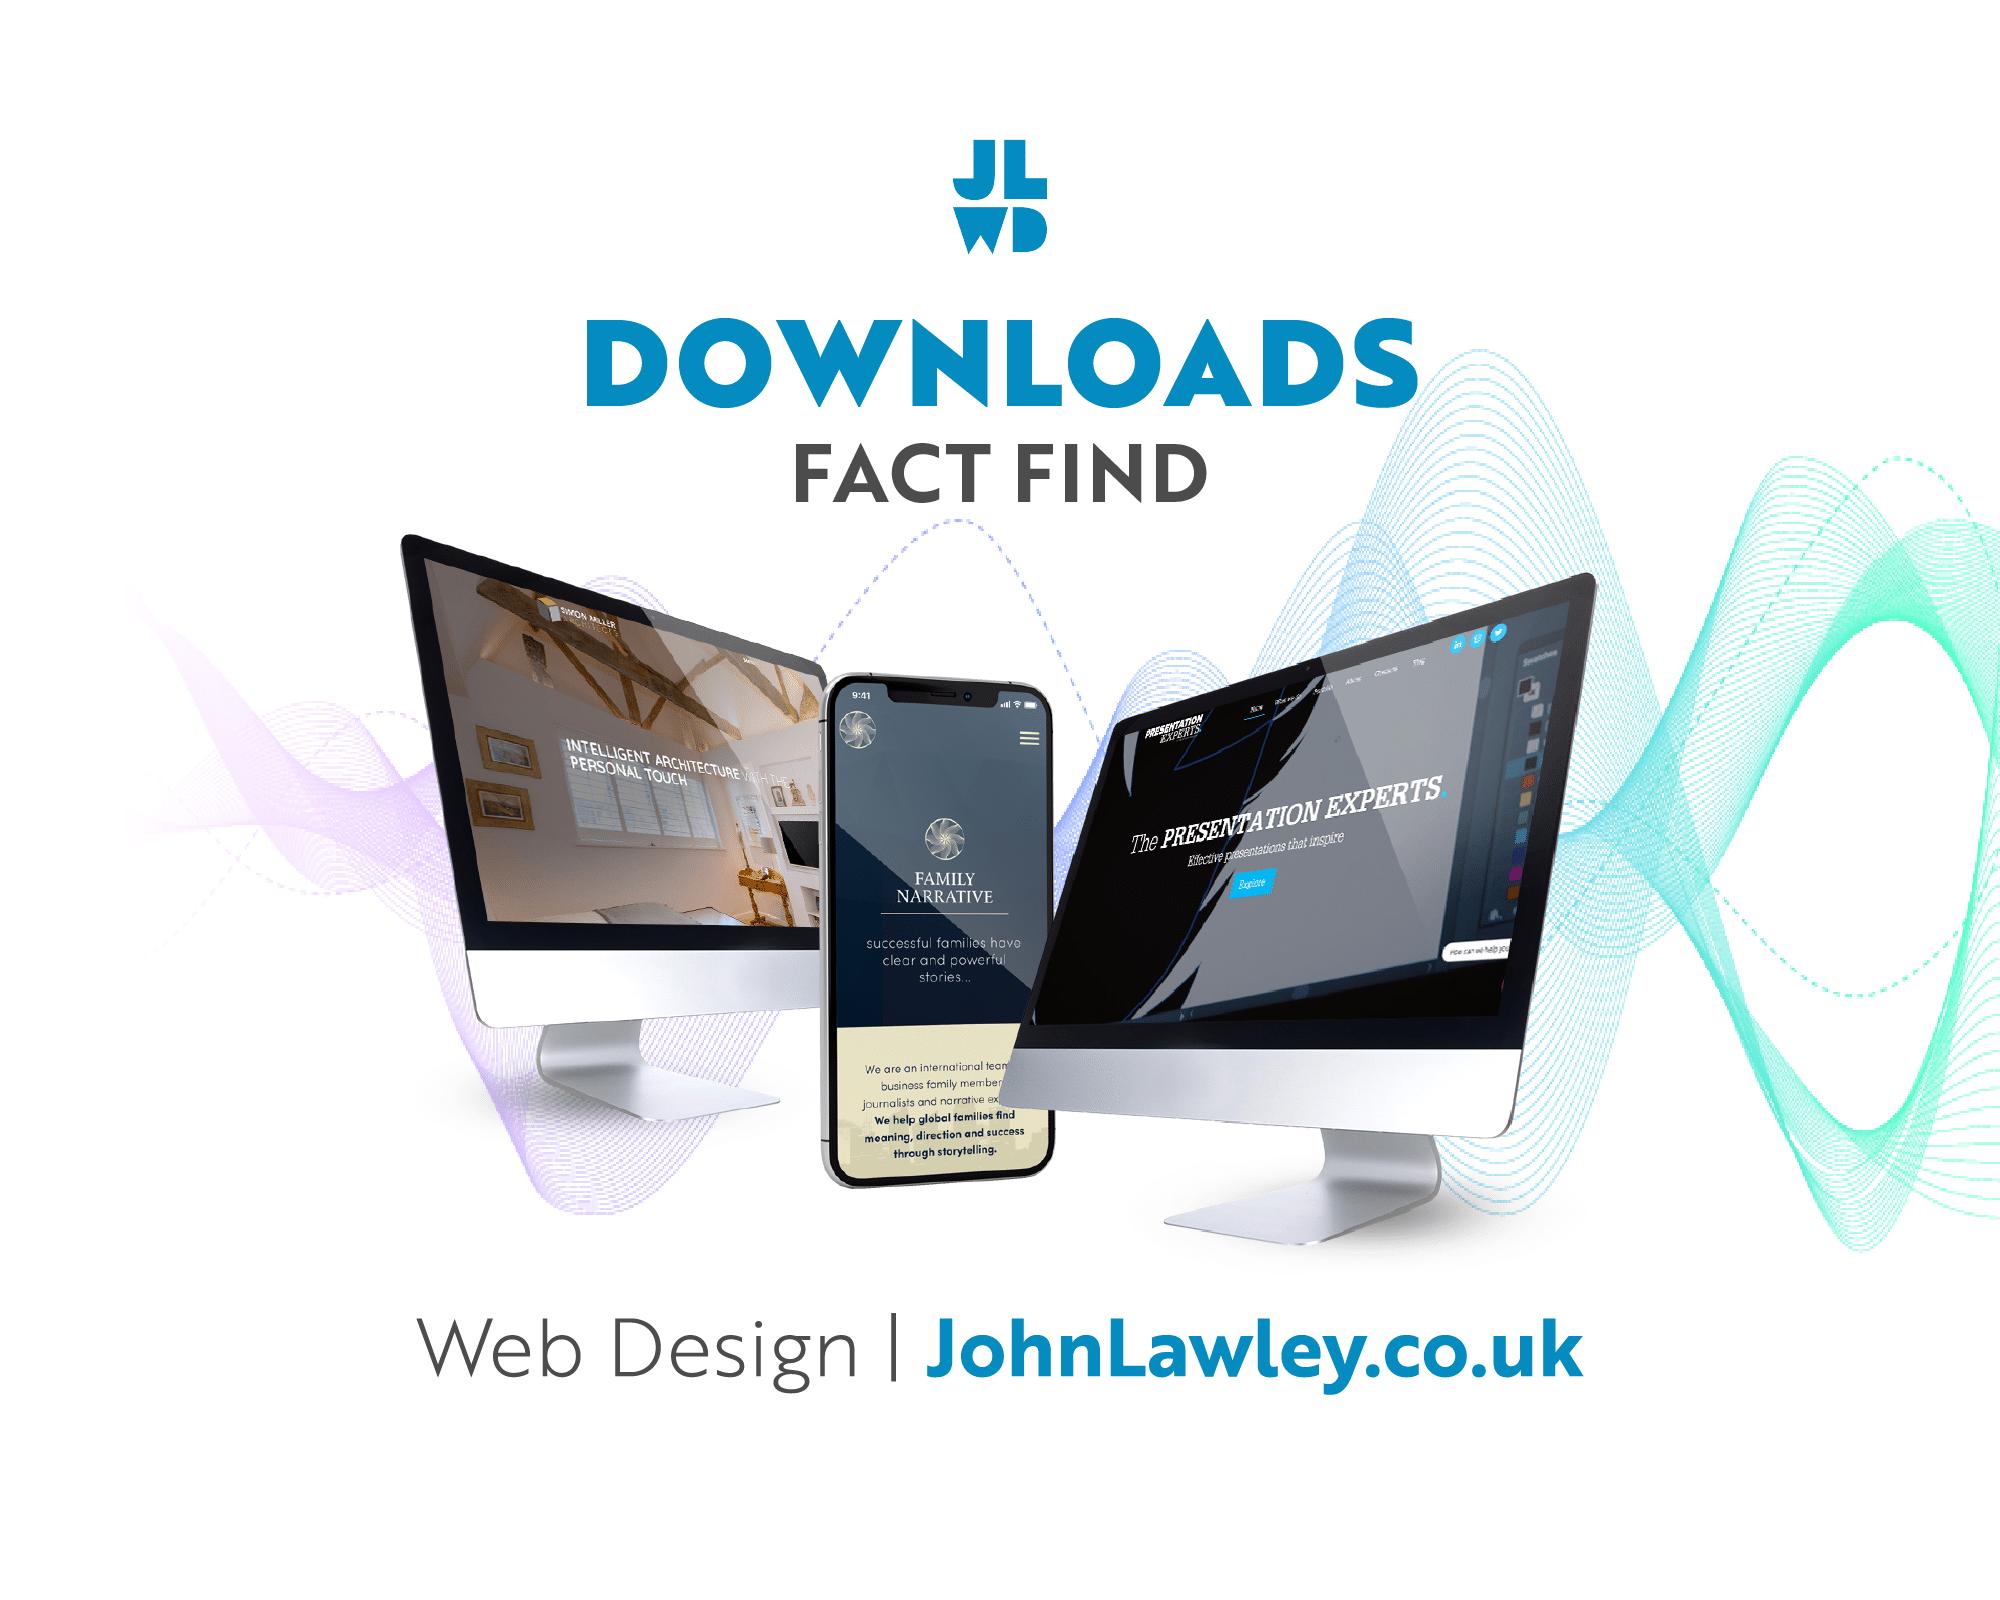 Web Design | Downloads | Facebook Fact Find